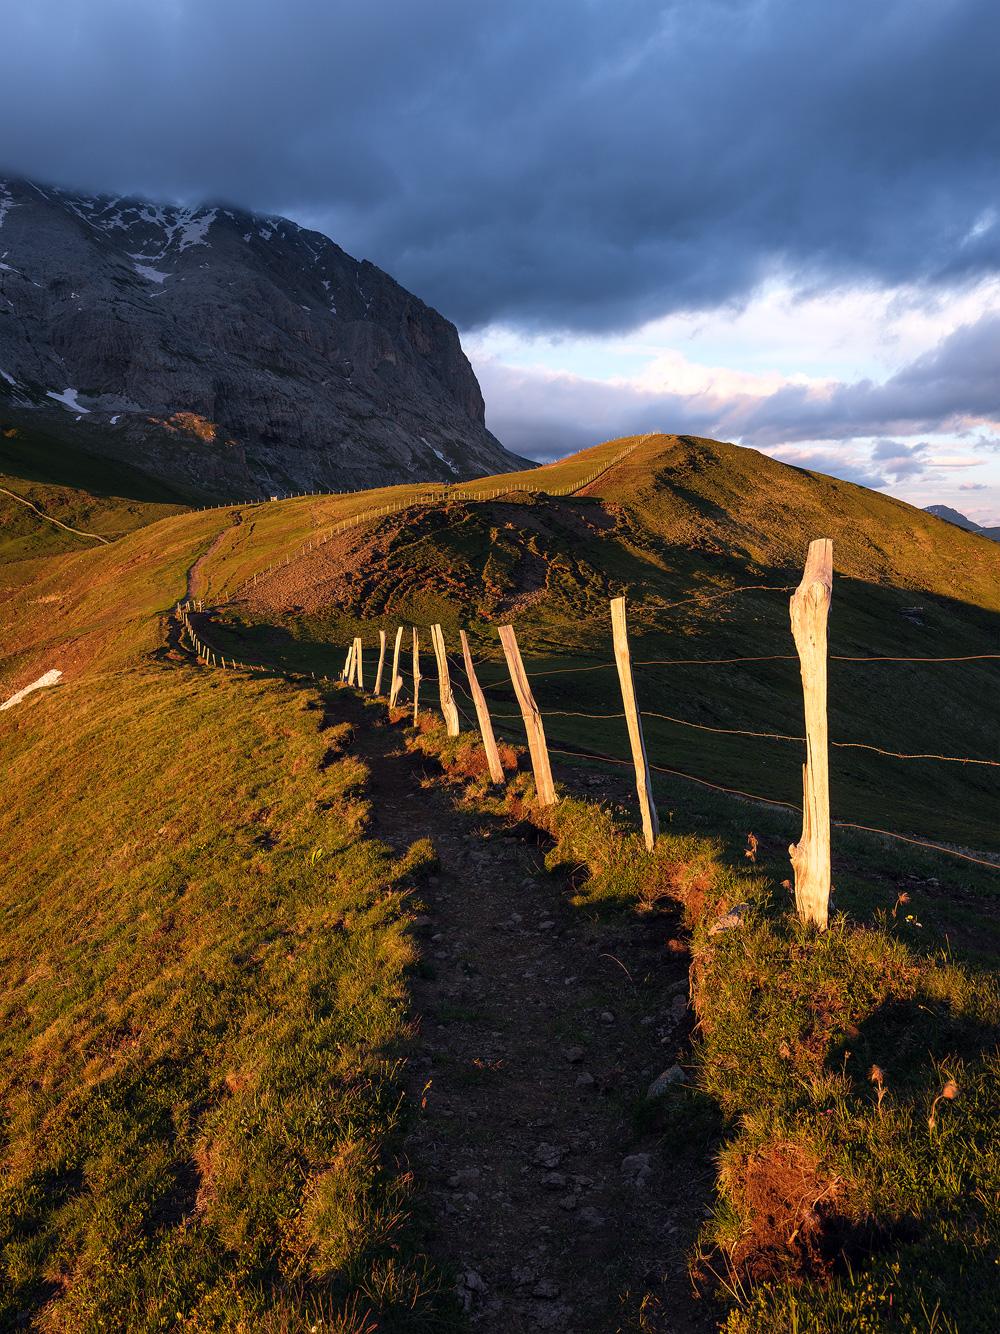 Approaching Plattkofel, Dolomites, Southy Tyrol, Italy by Nils Leonhardt.jpg